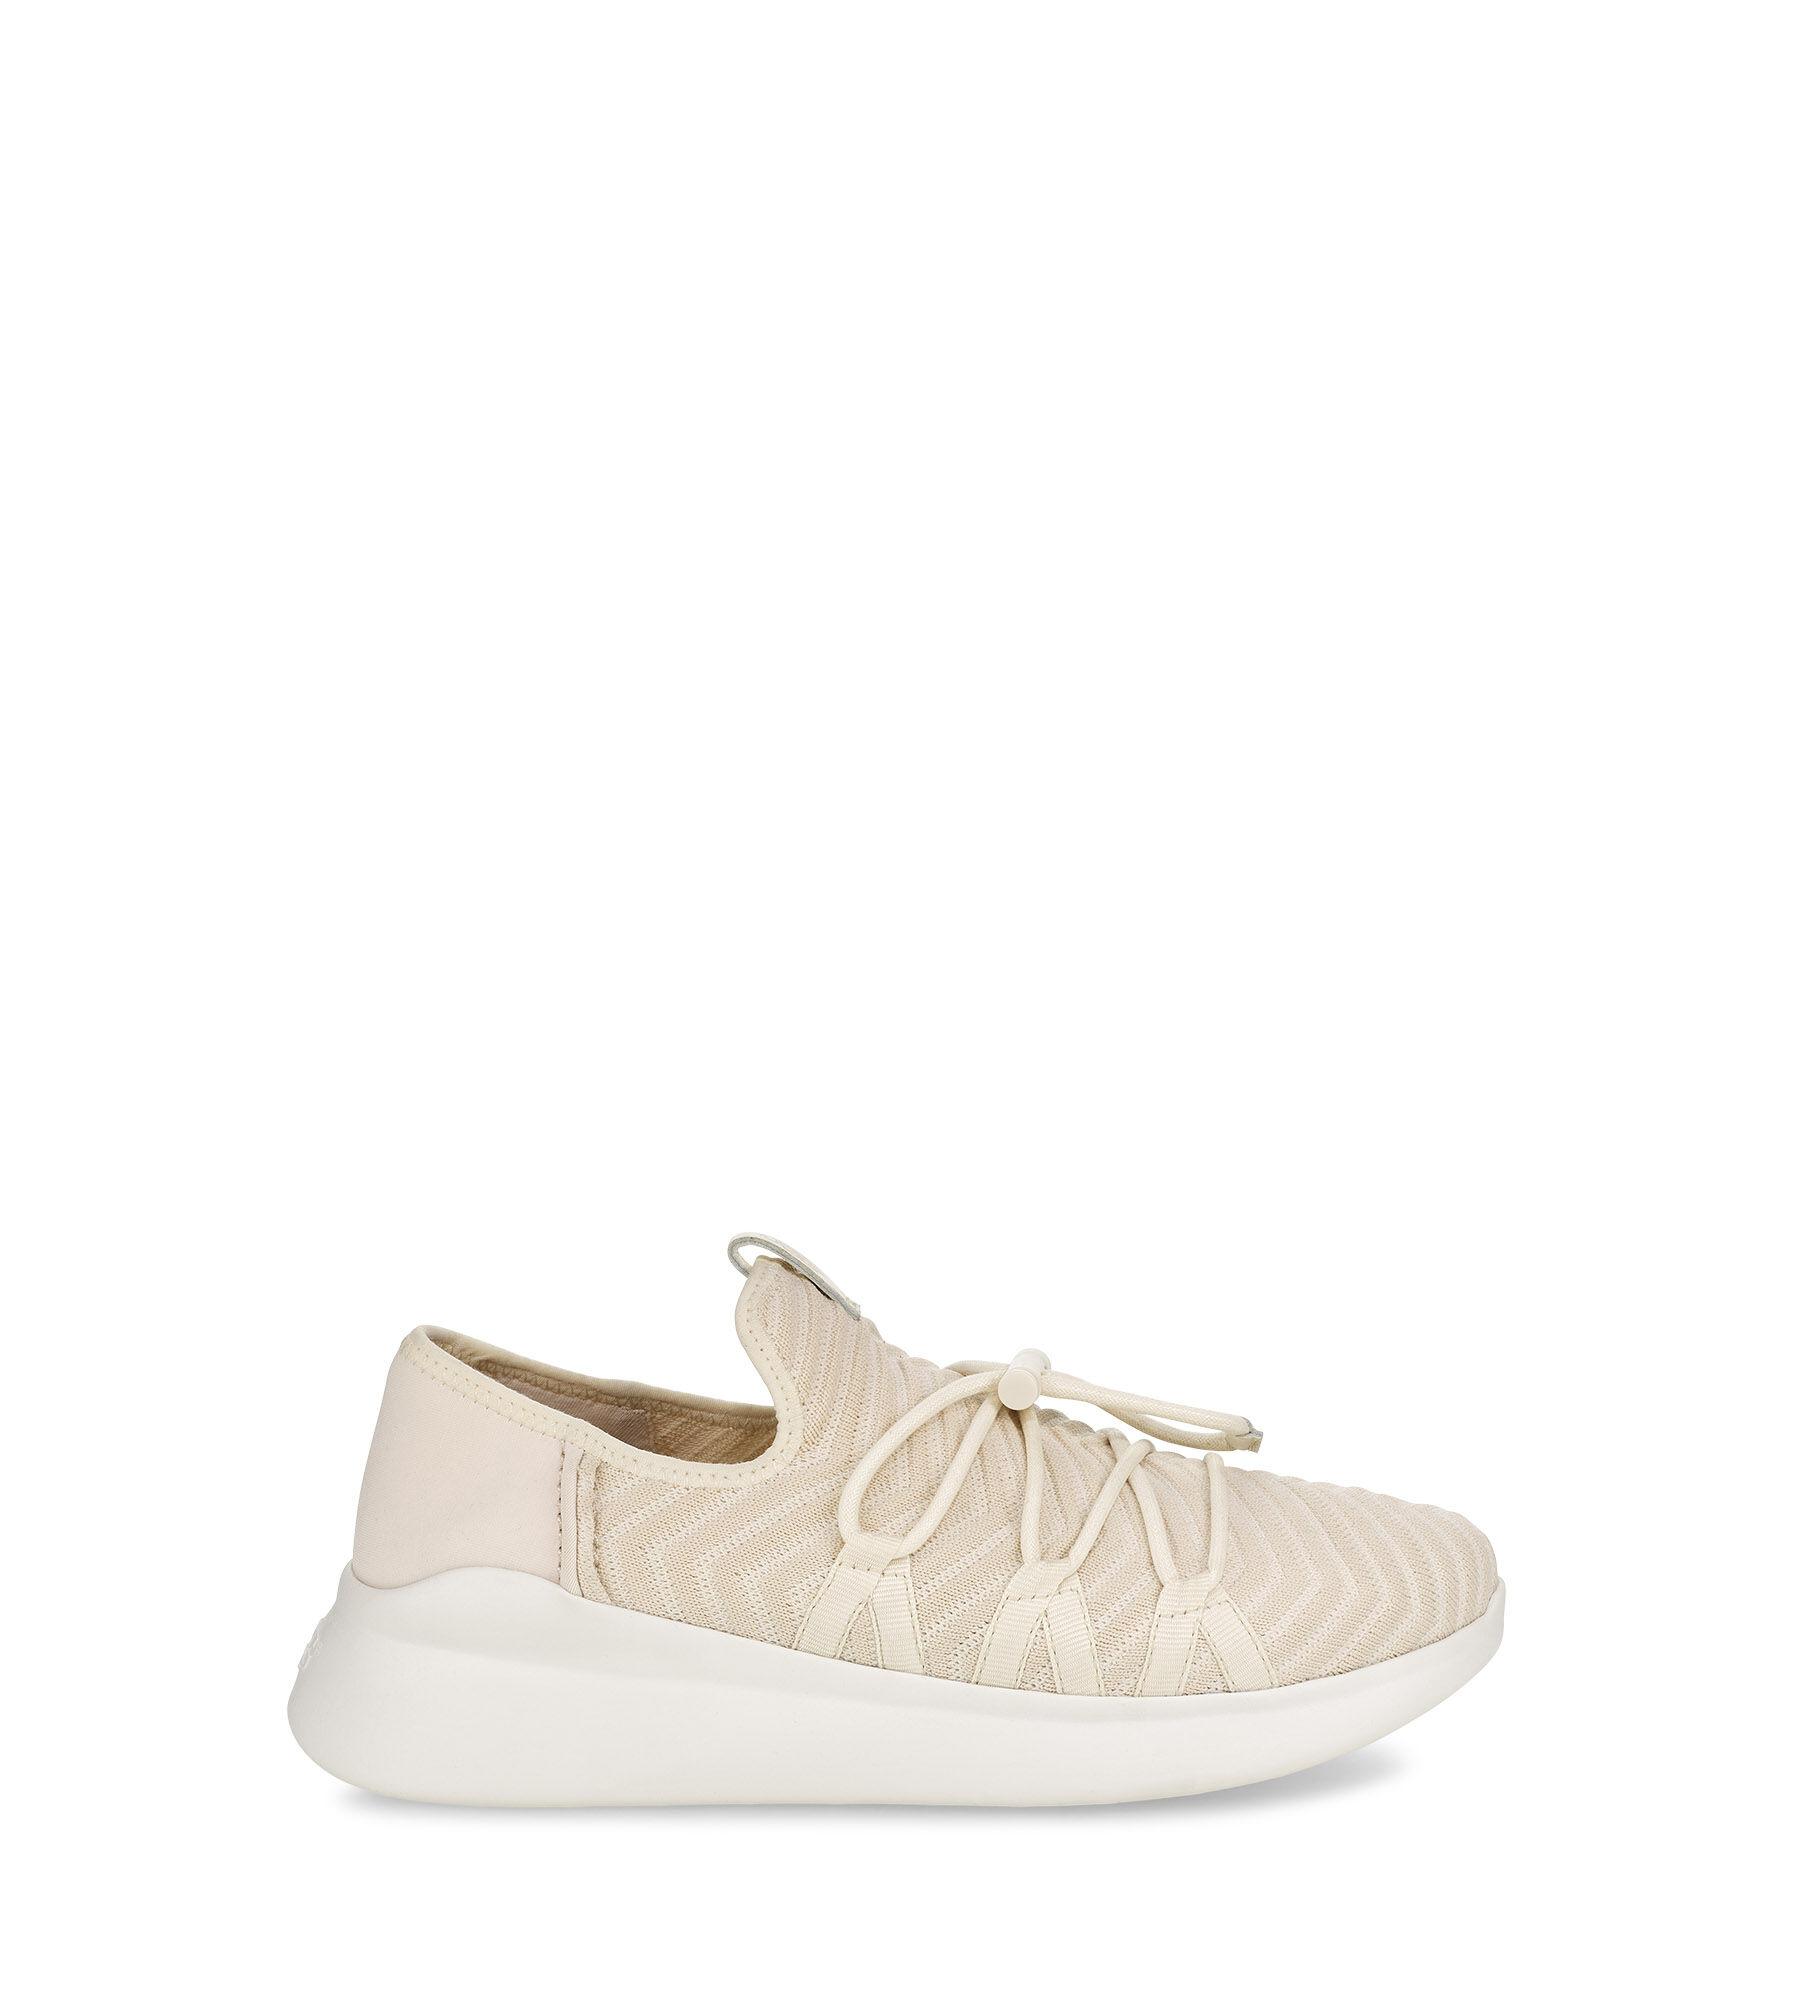 White Slip On Shoes Womens